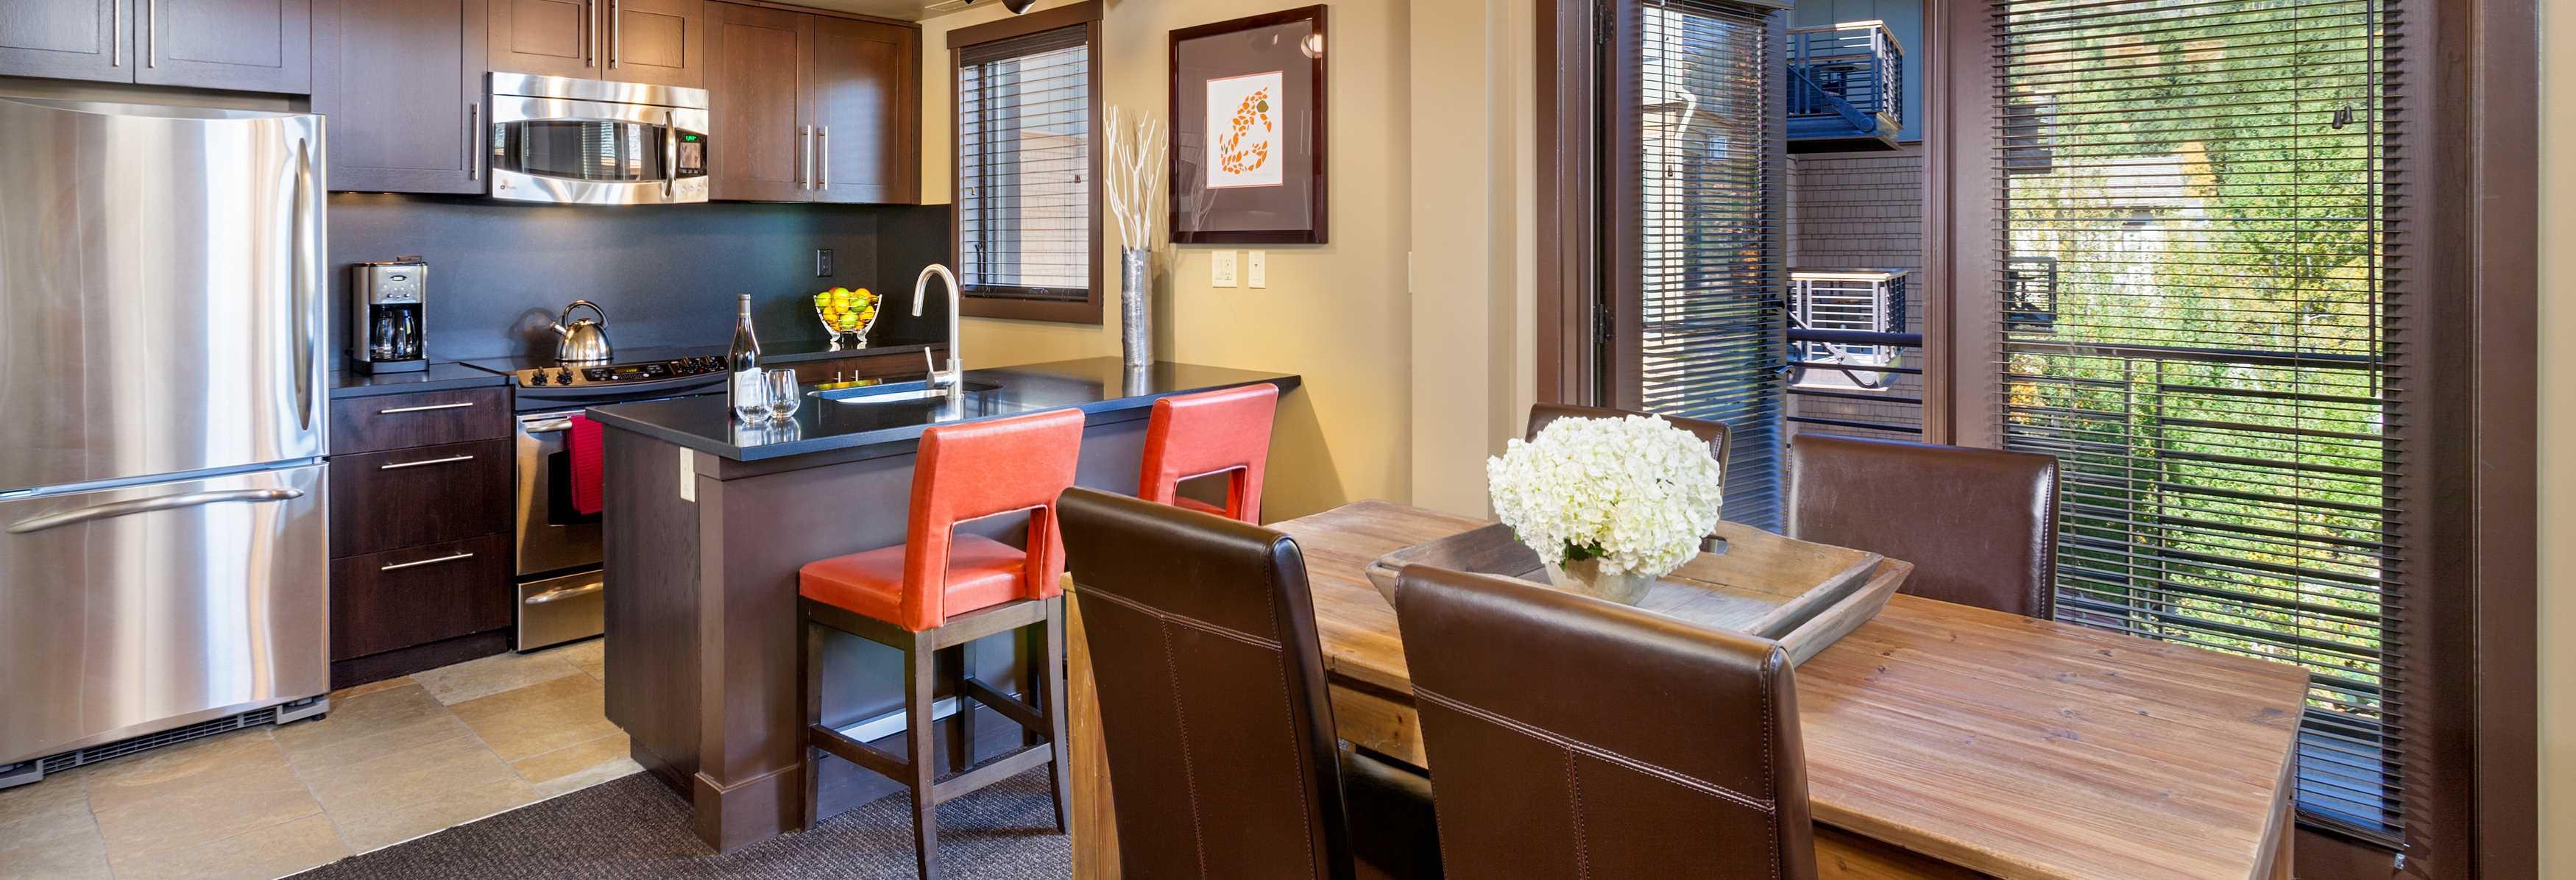 Jackson Hole Wyoming Inspirato Luxury Vacation Homes Inspirato